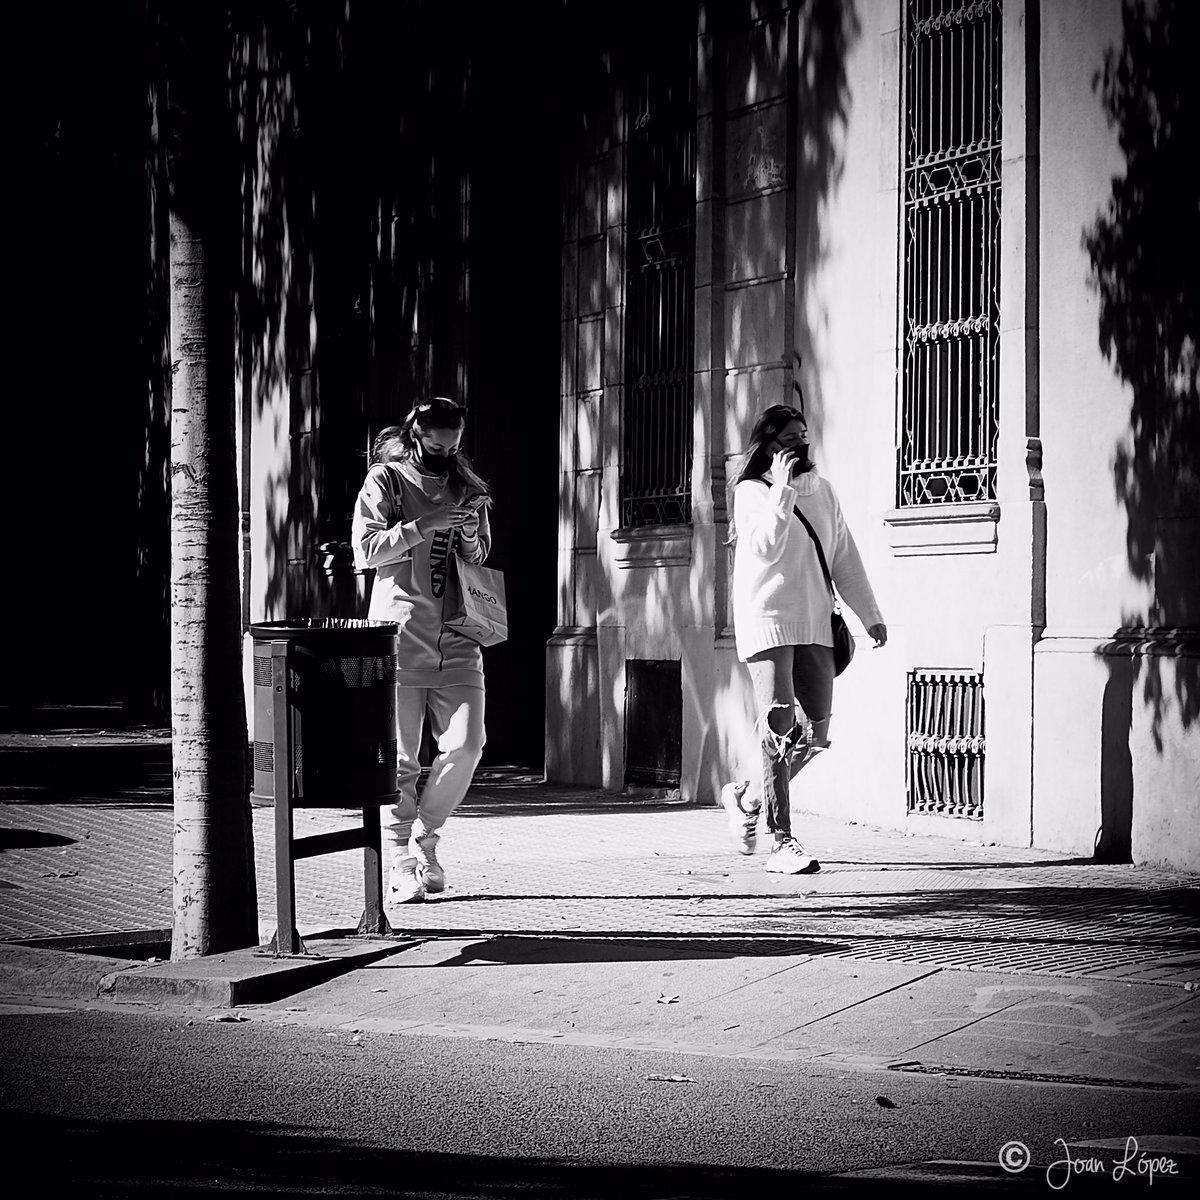 Mobile communication #barcelona #city #smartphone #street #streets #streetphotography #streetphotographer #urban #urbanphotography #socialphotography  #documentary #photooftheday #picoftheday #blackandwhite #blackandwhitephotography #photography #photographer #PhotographyIsArt https://t.co/zcamLSRQR5